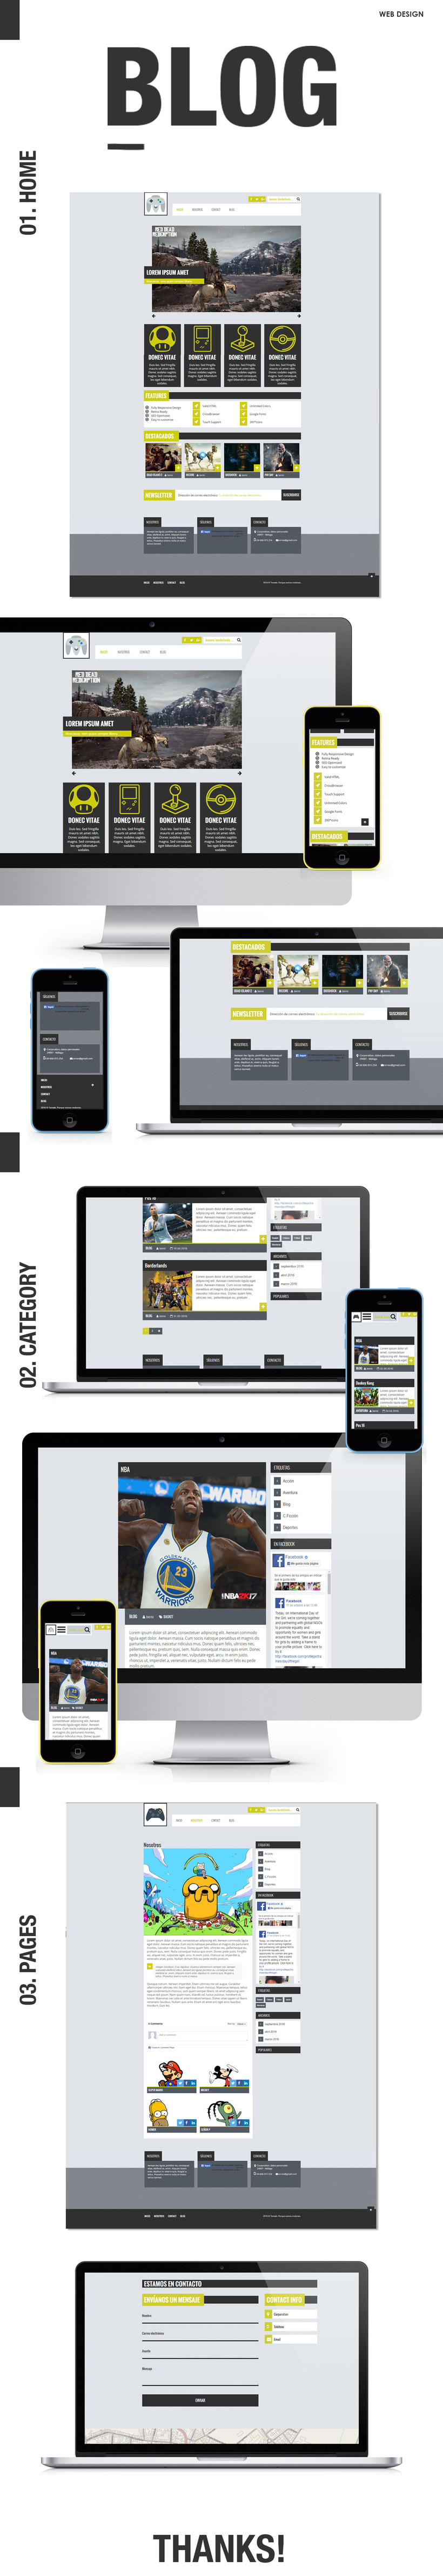 Blog VideoGamers -1